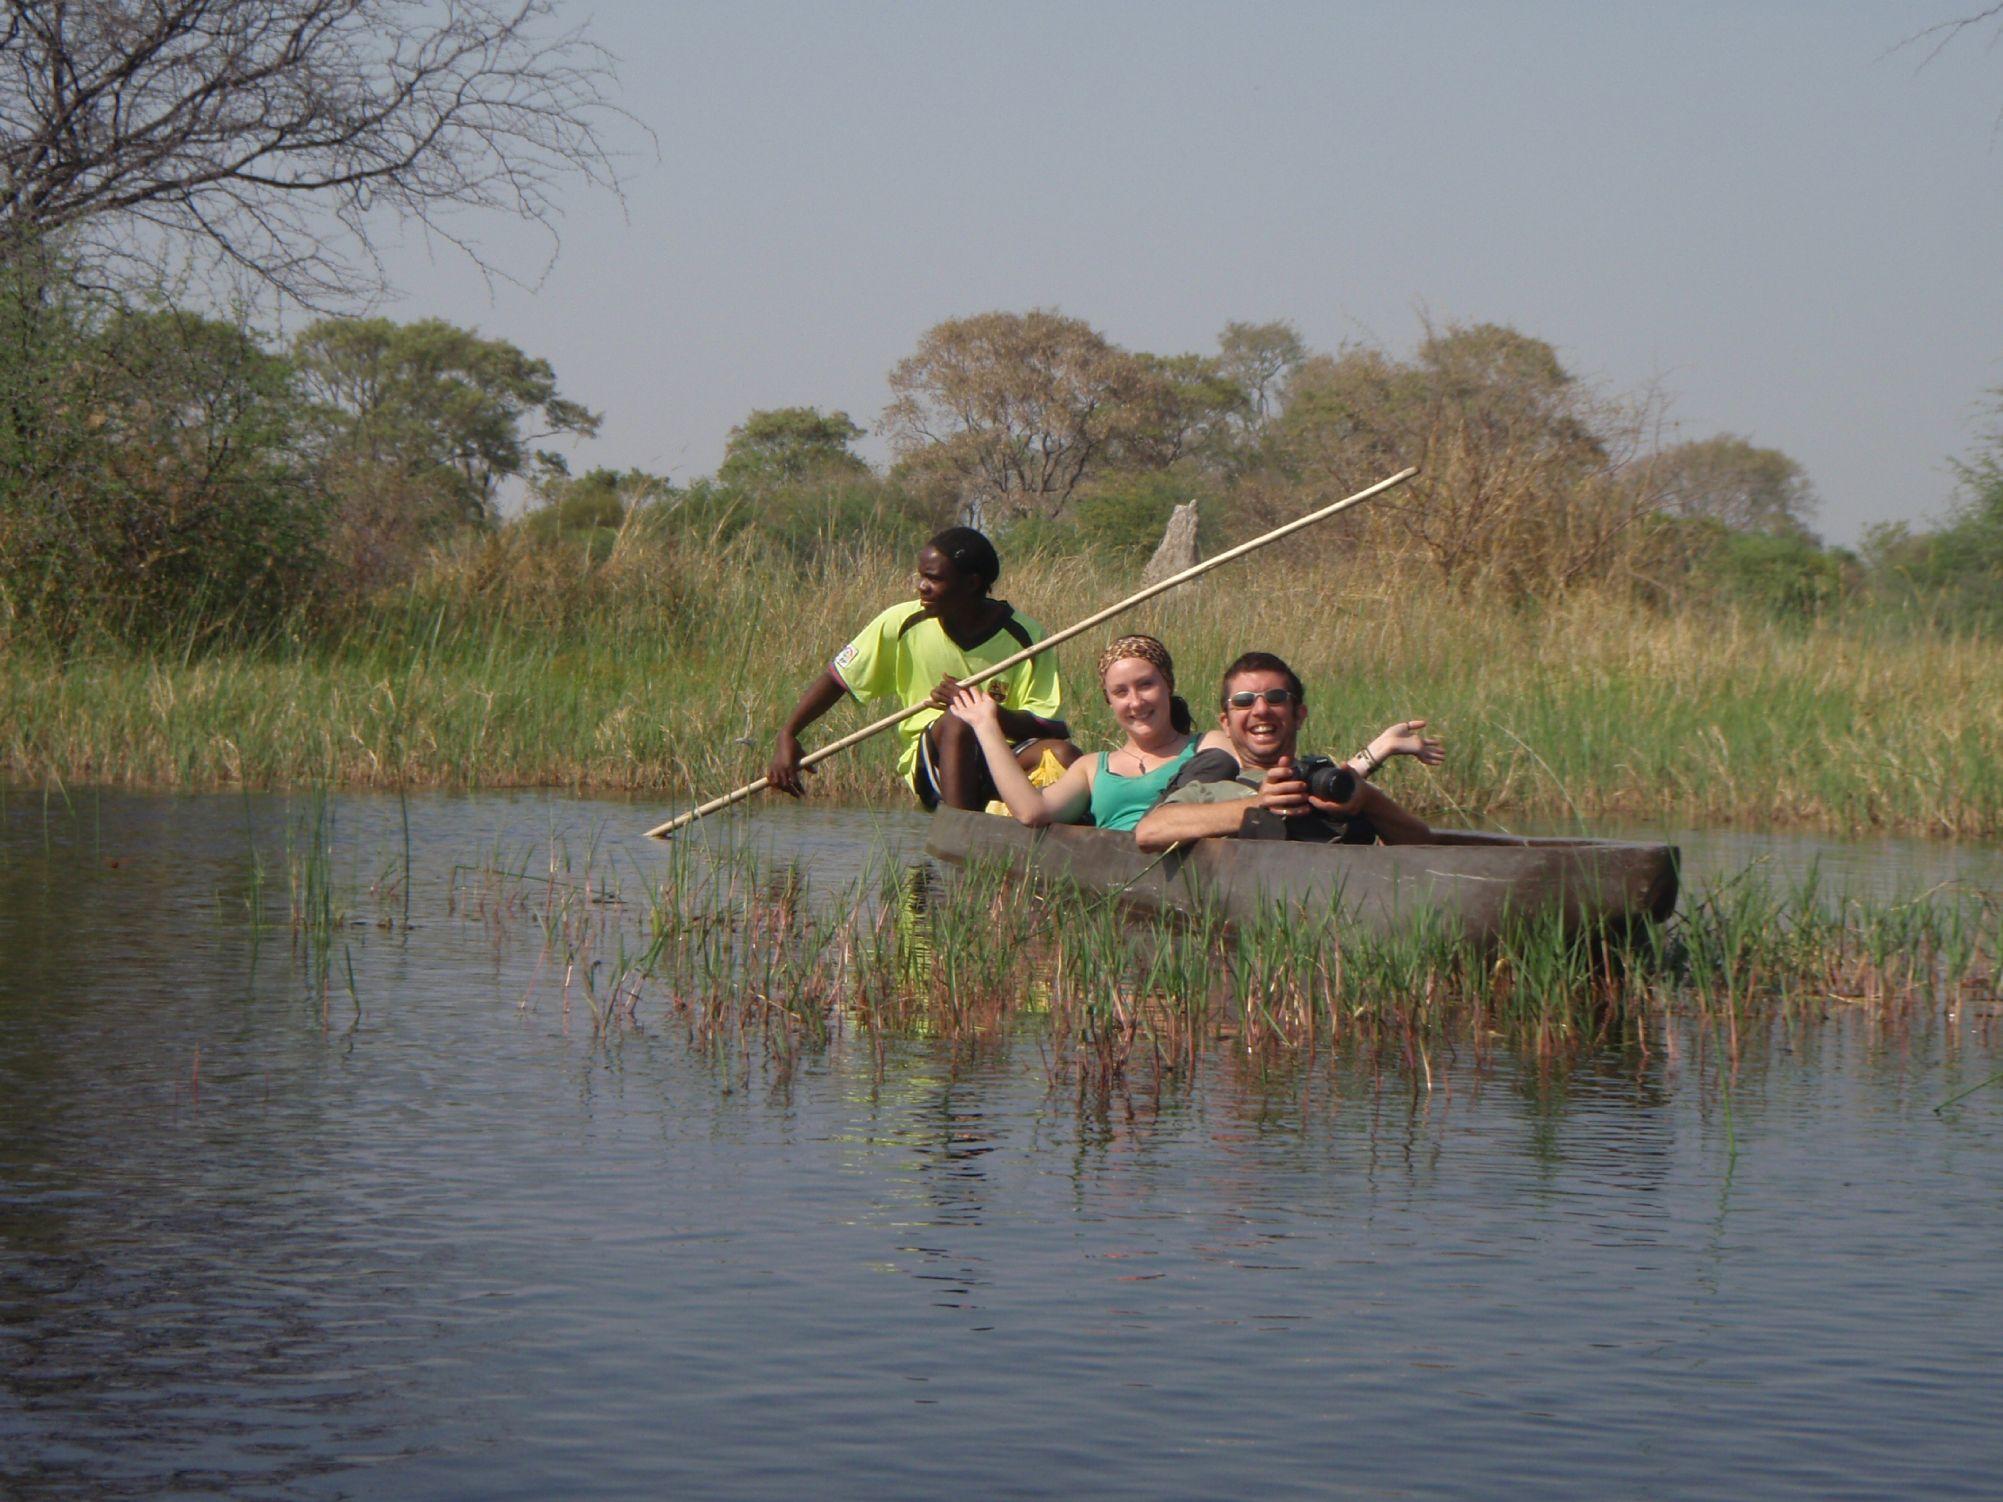 Okavango Delta, Botswana - Best Destinations for an African Safari